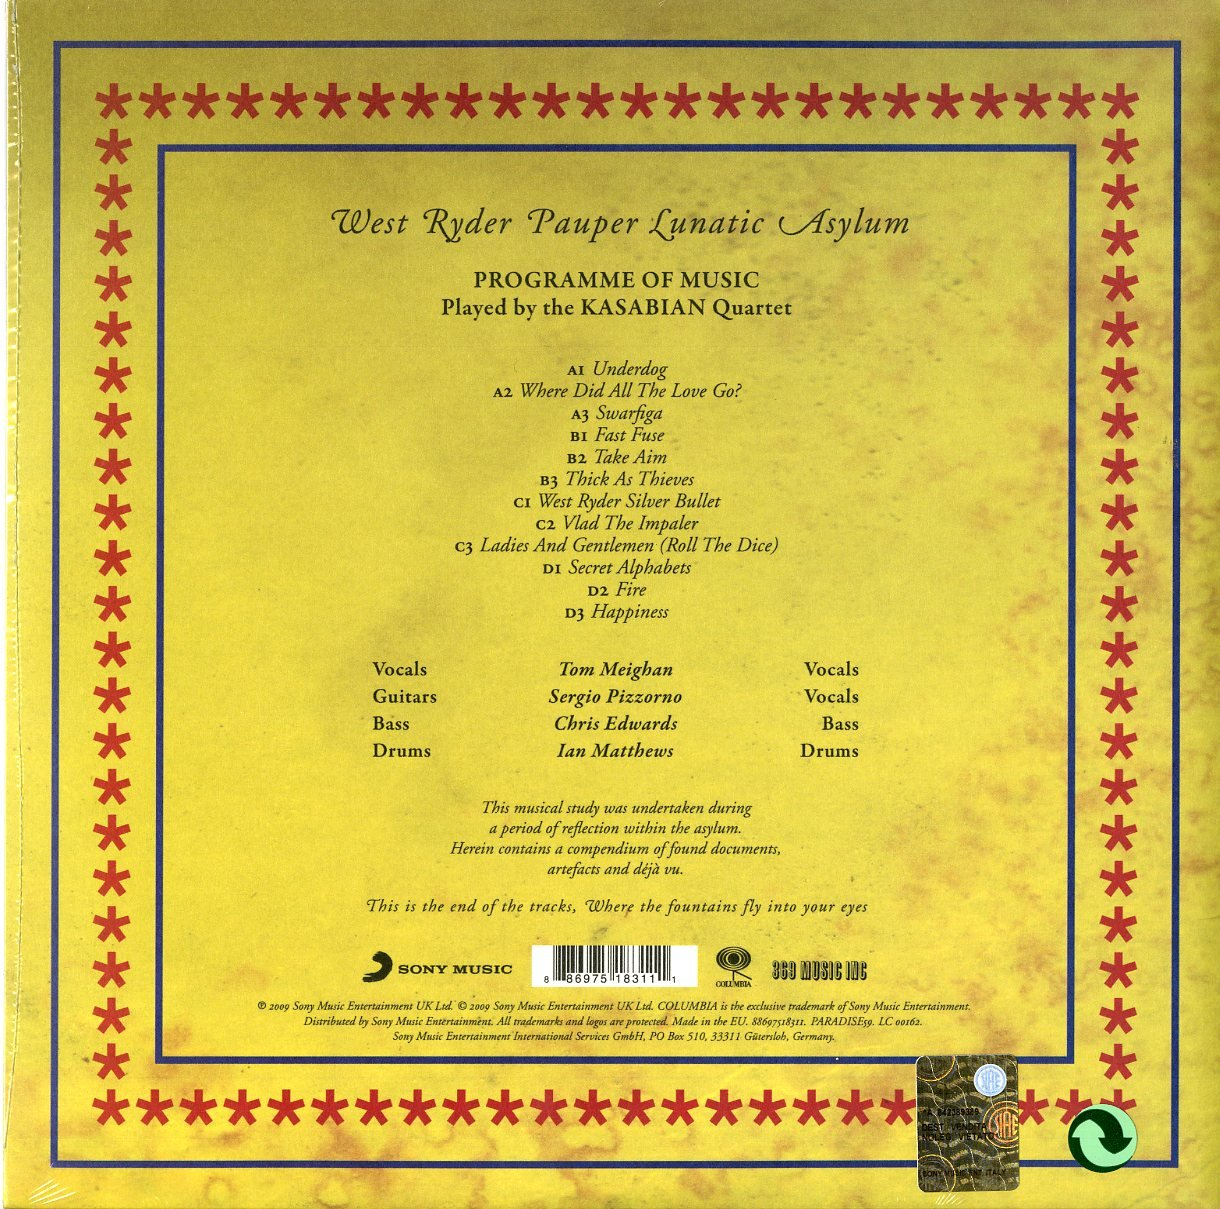 West Ryder Pauper Lunat Asylum [Vinyl]